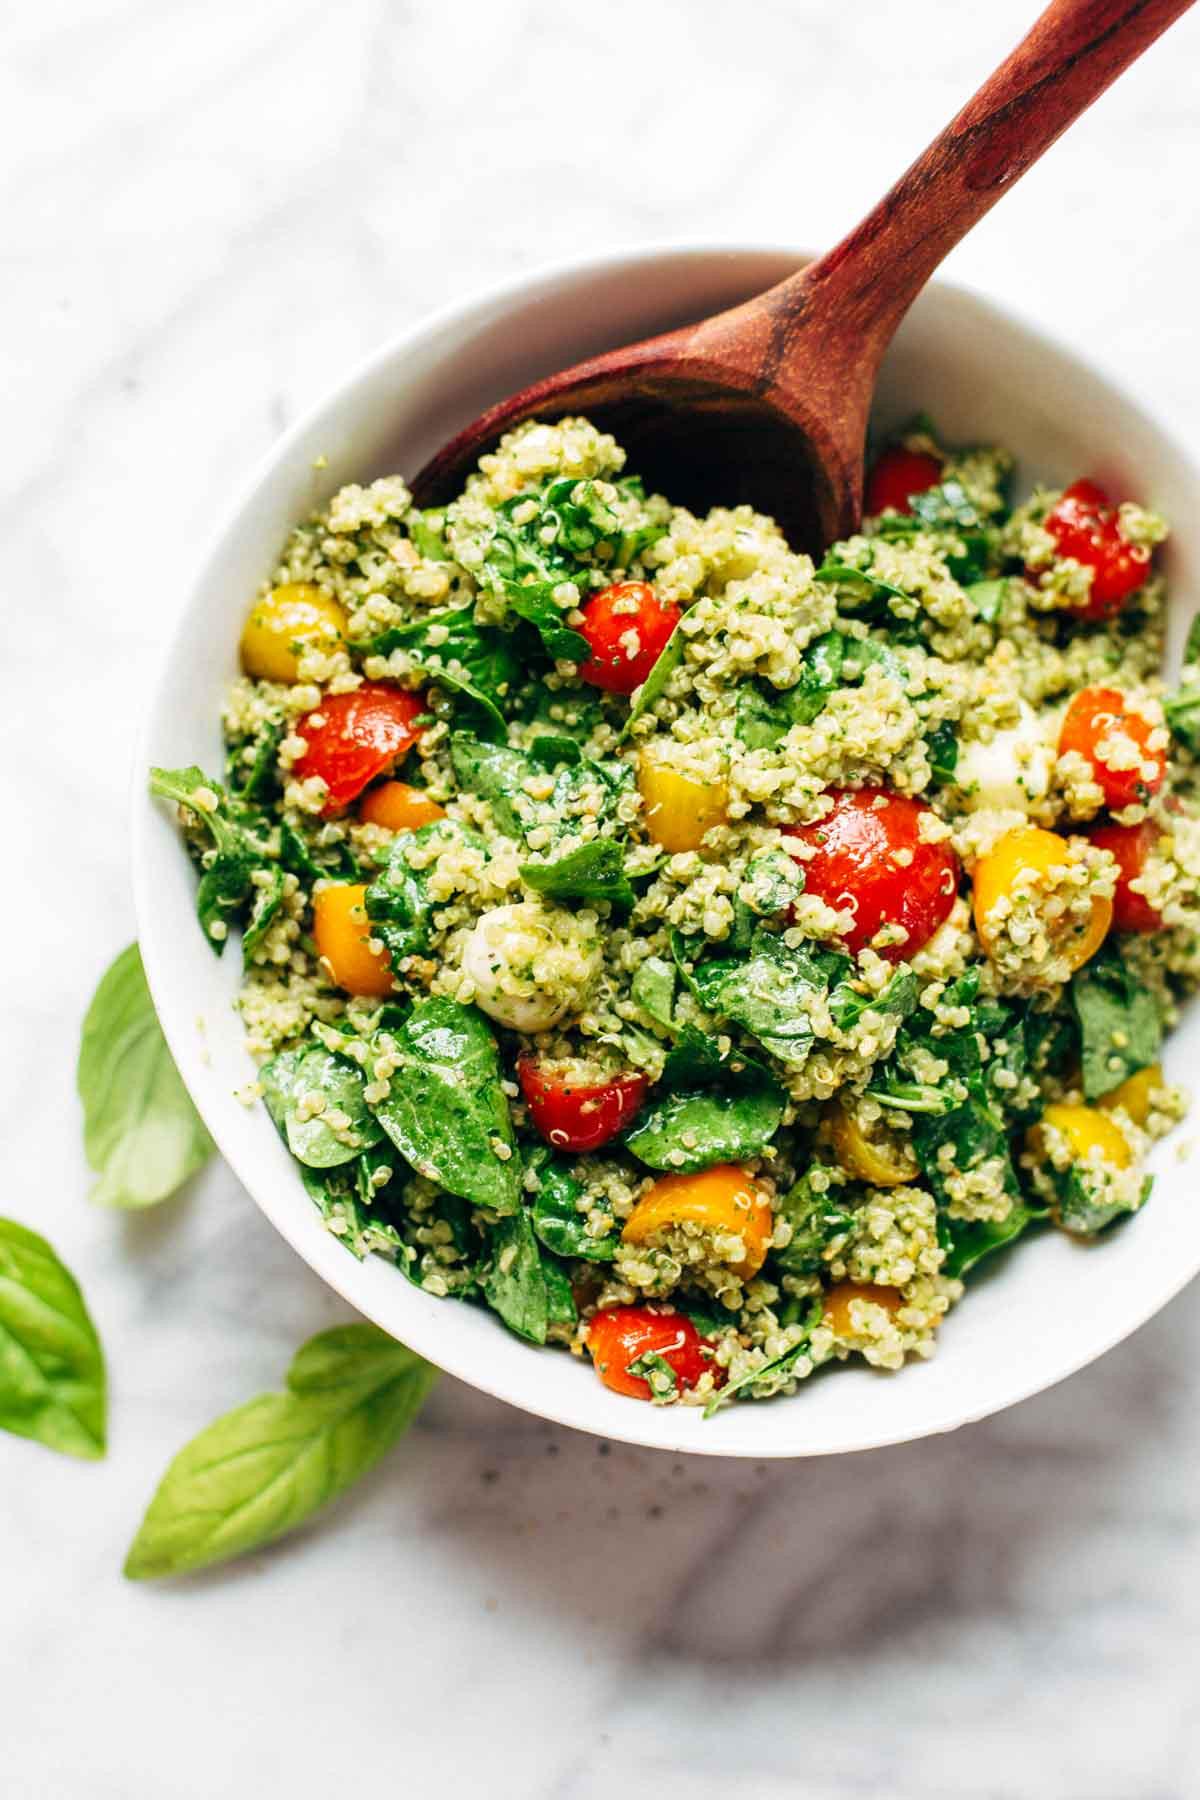 Summer Quinoa Salad Recipe  Green Goddess Quinoa Summer Salad Recipe Pinch of Yum